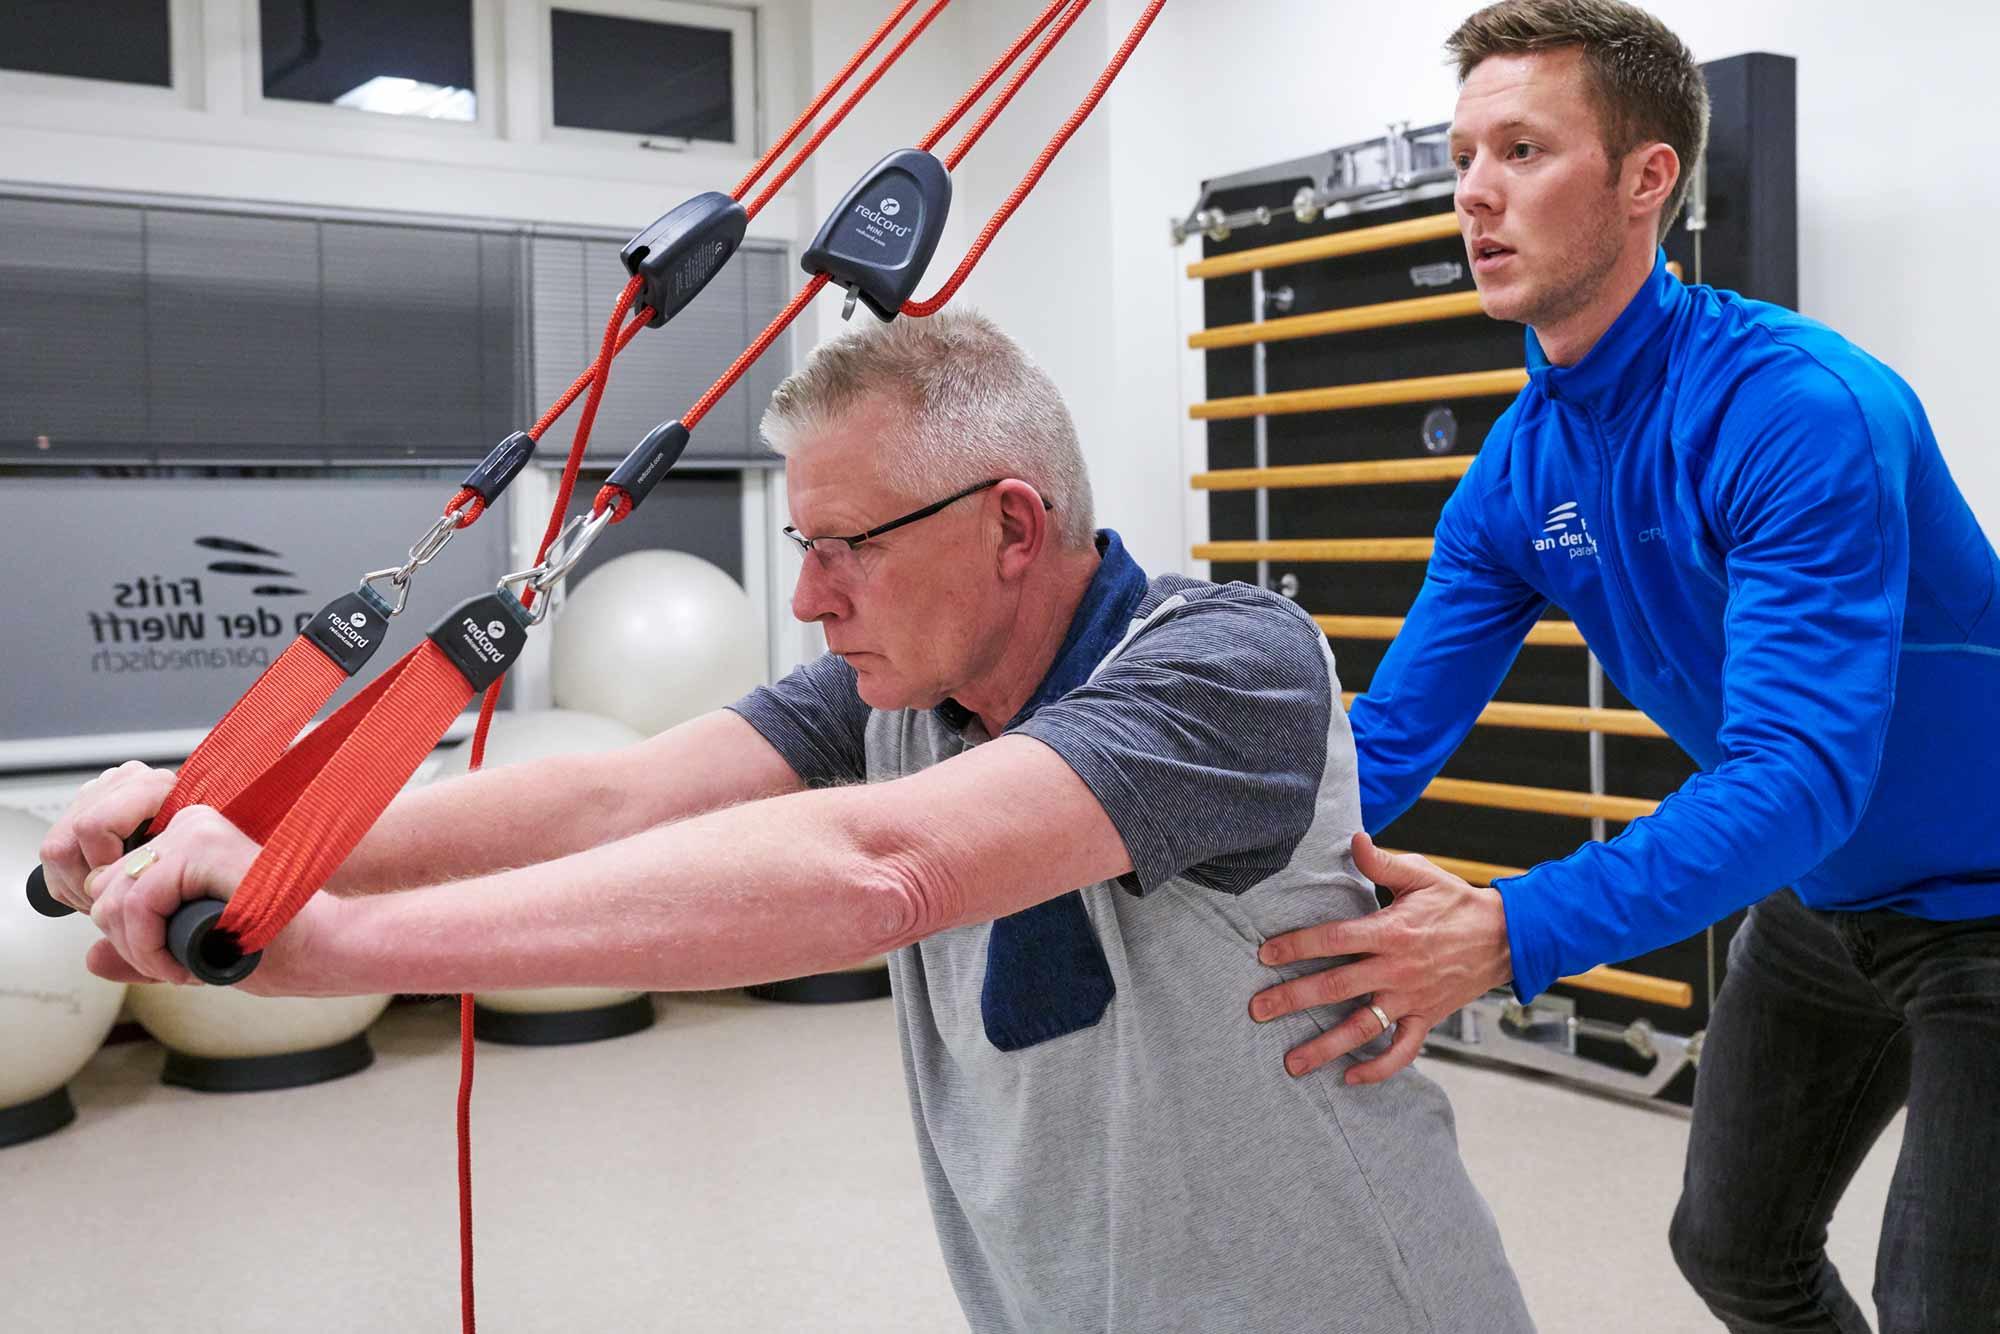 Frits van der Werff Inloopspreekuur fysiotherapie